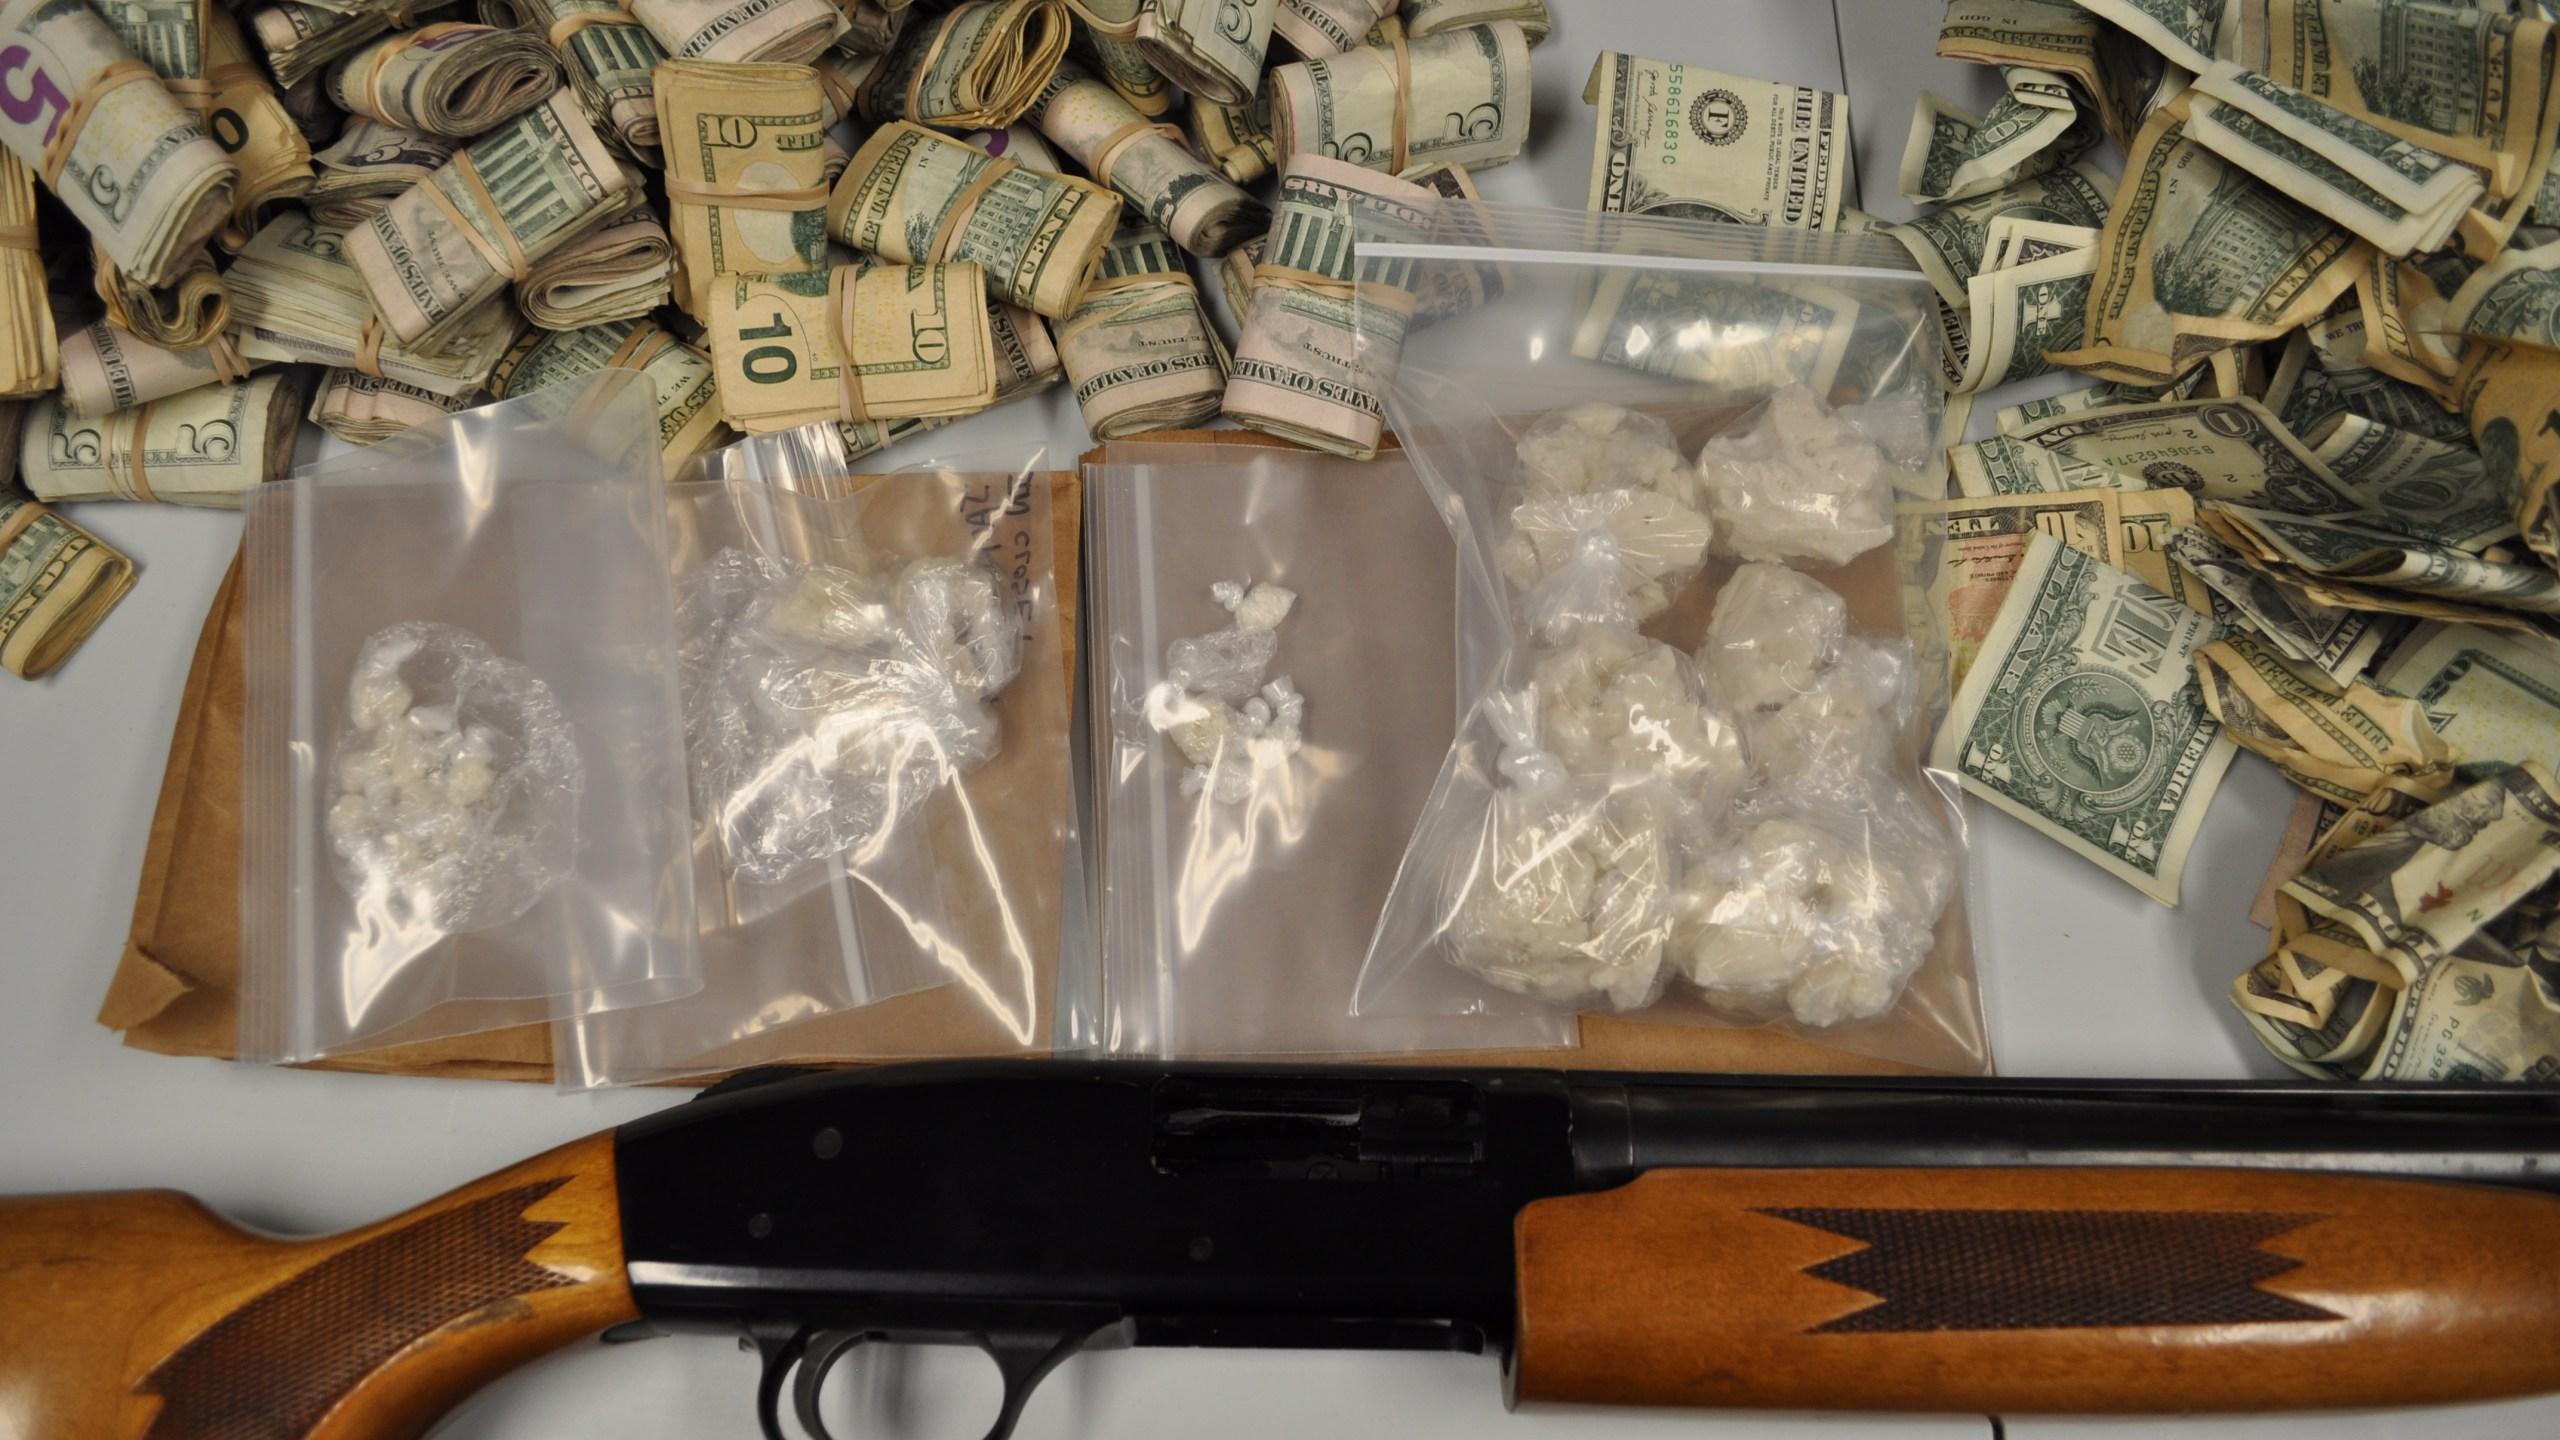 Kokomo drug arrest evidence